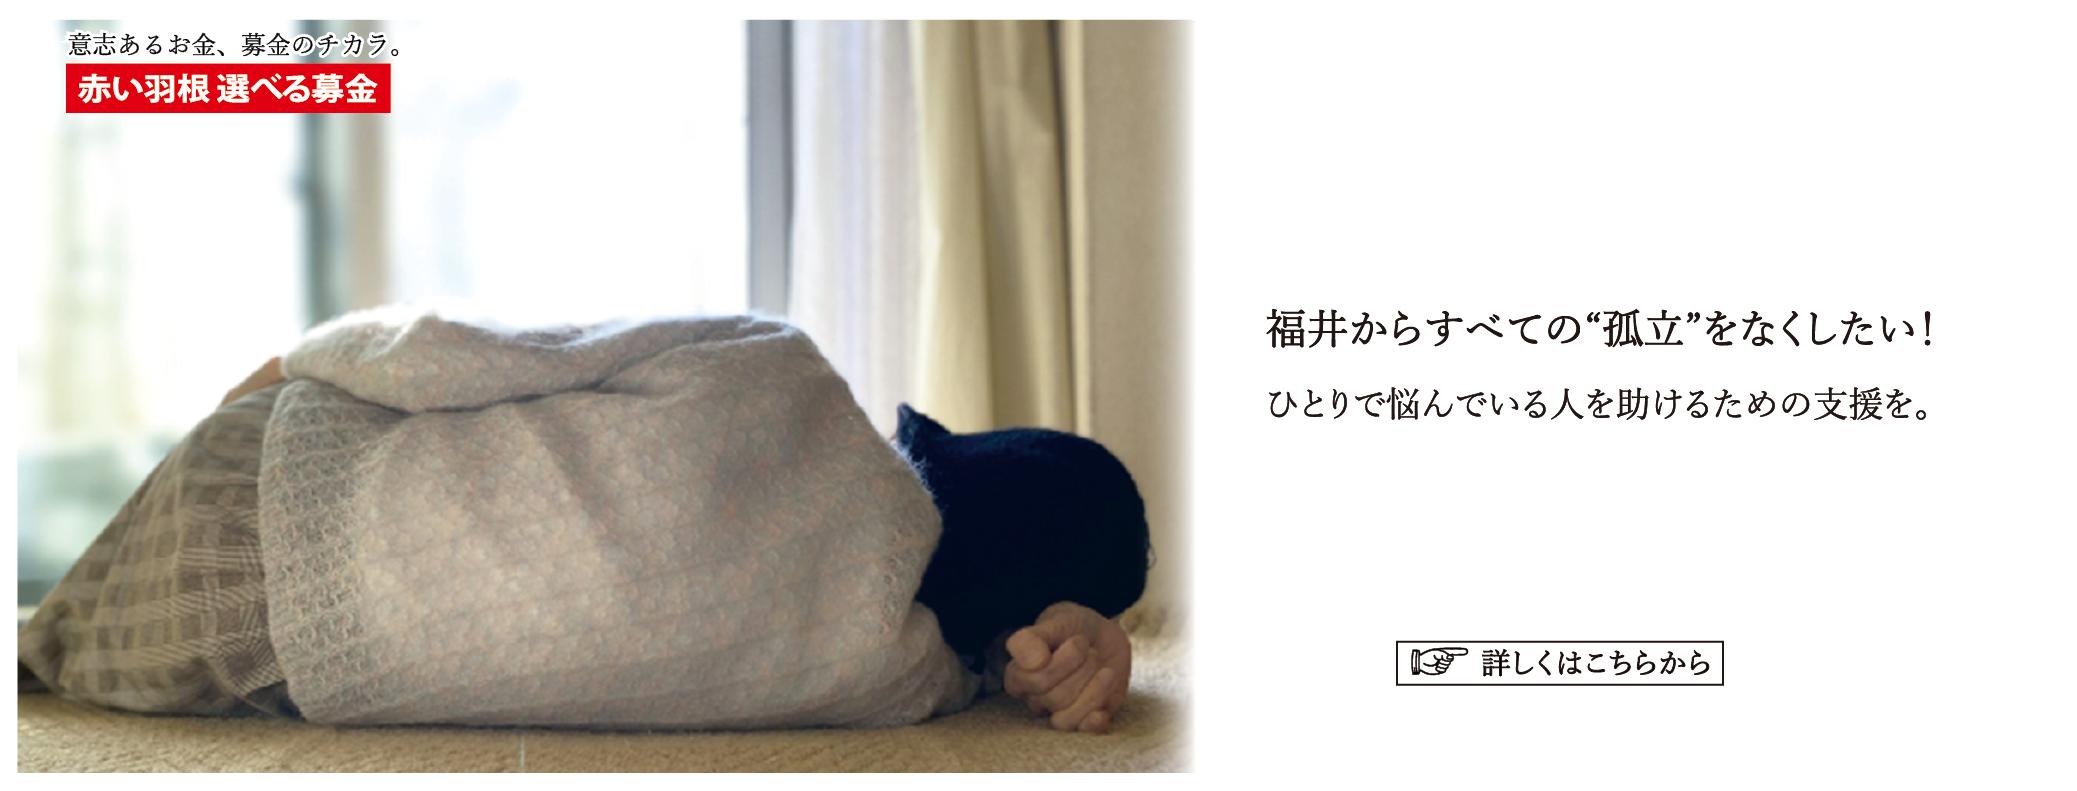 2021_HP_kodoku-01.png